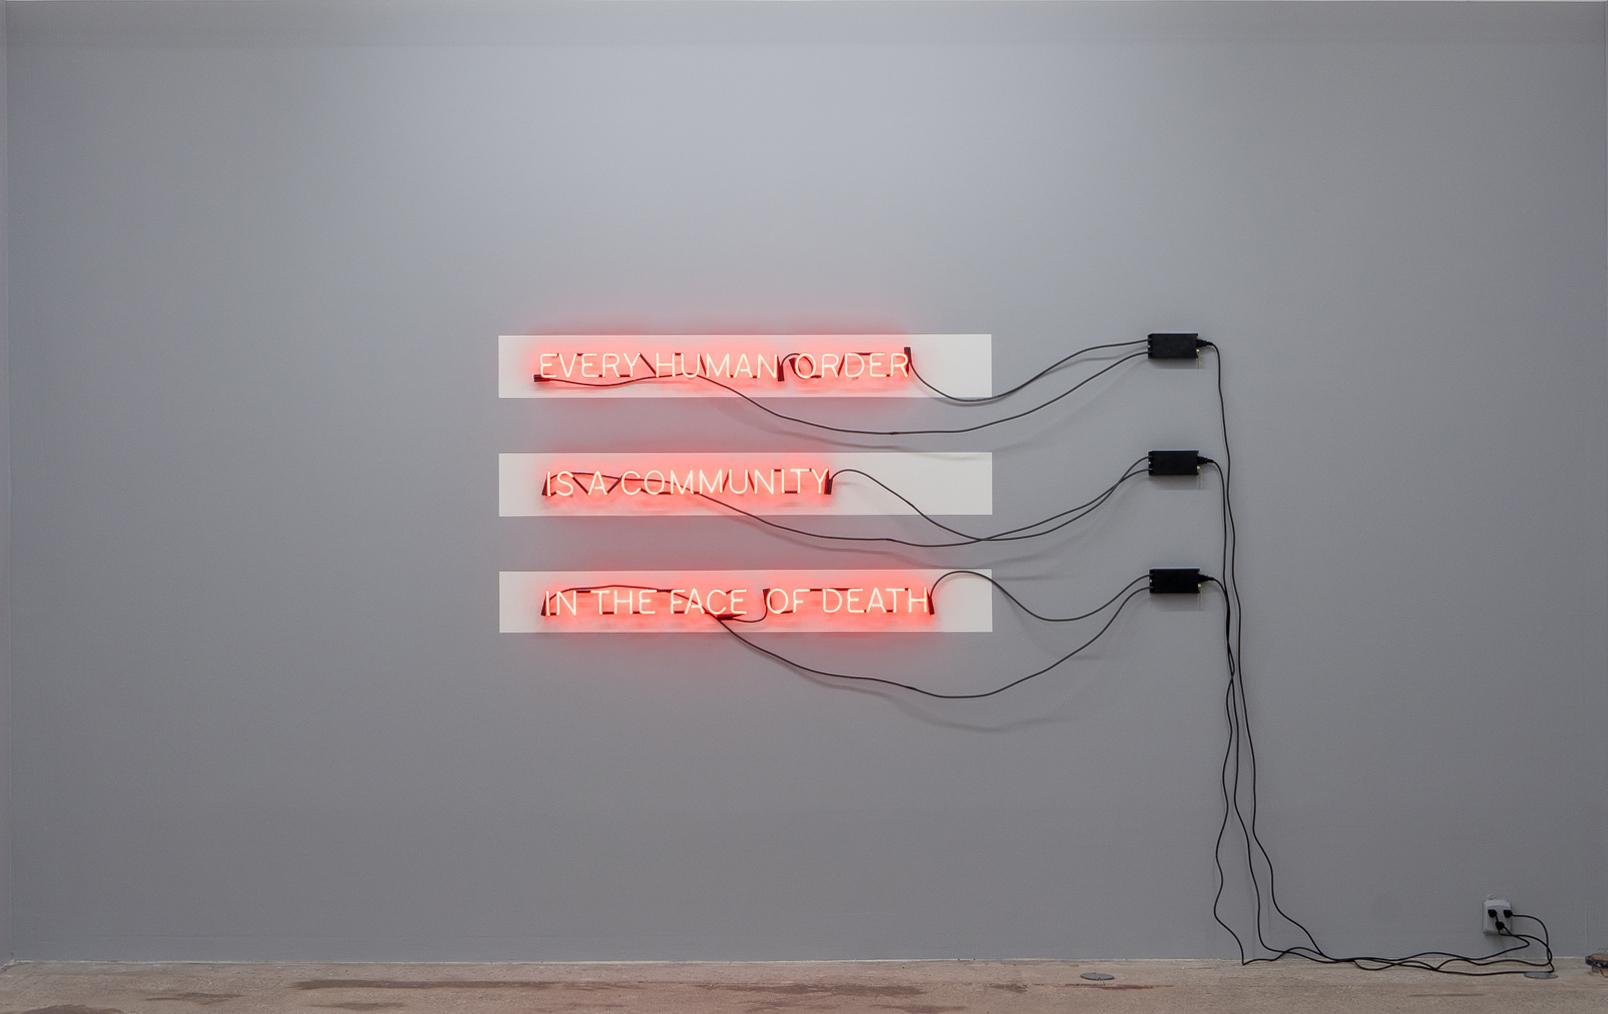 Carl Trahan,  In the Face of Death,  2018, enseigne au néon, transformateurs, peinture, dimensions variables.